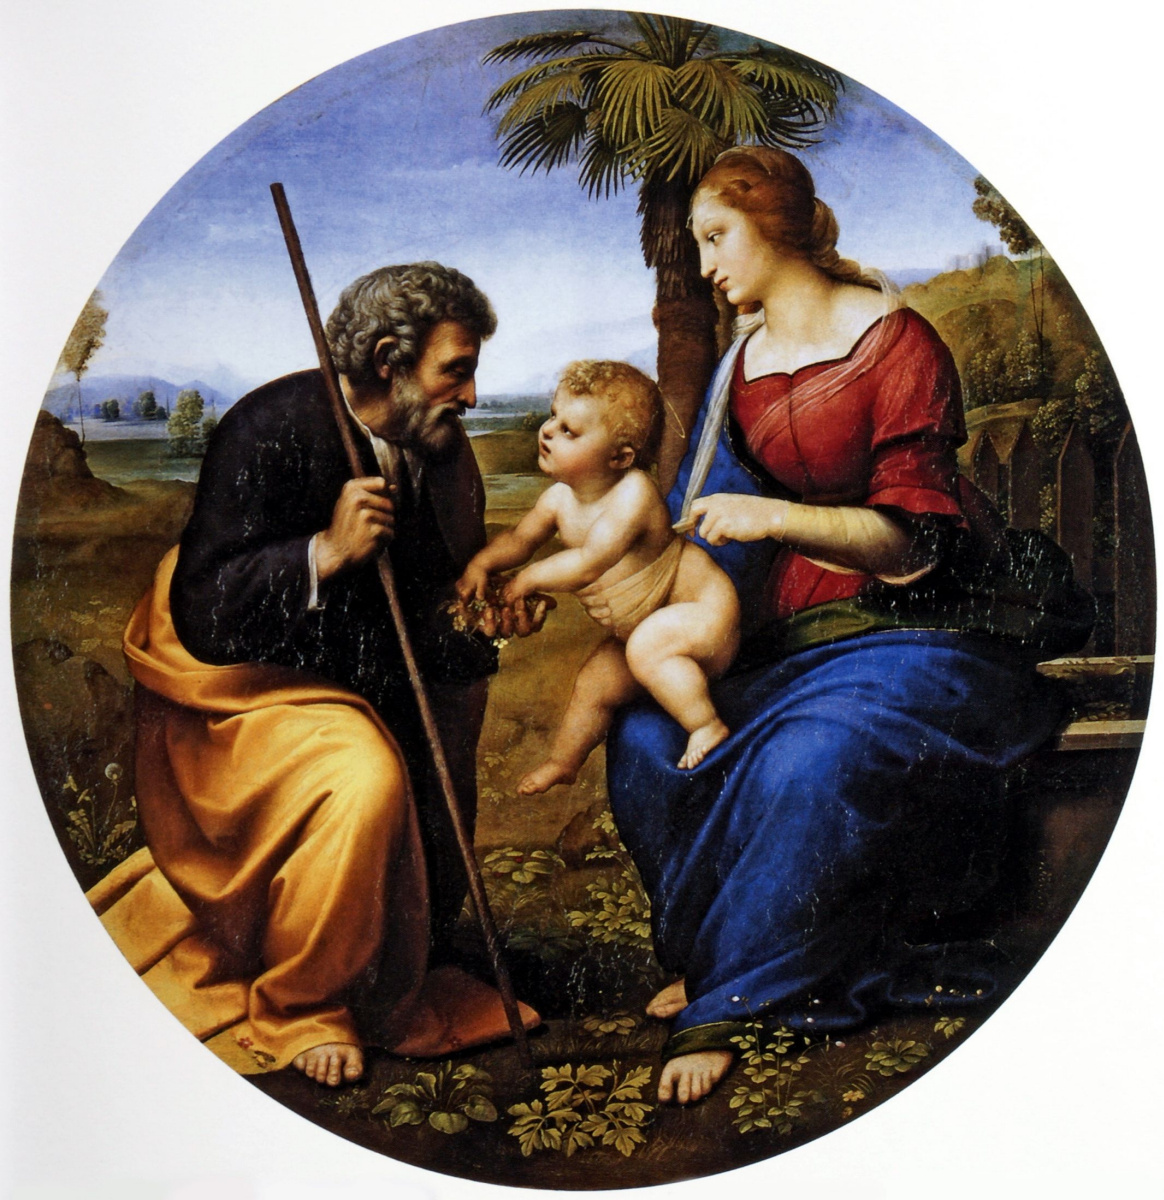 Raphael Sanzio. Holy family under a palm tree (Madonna under a palm tree)